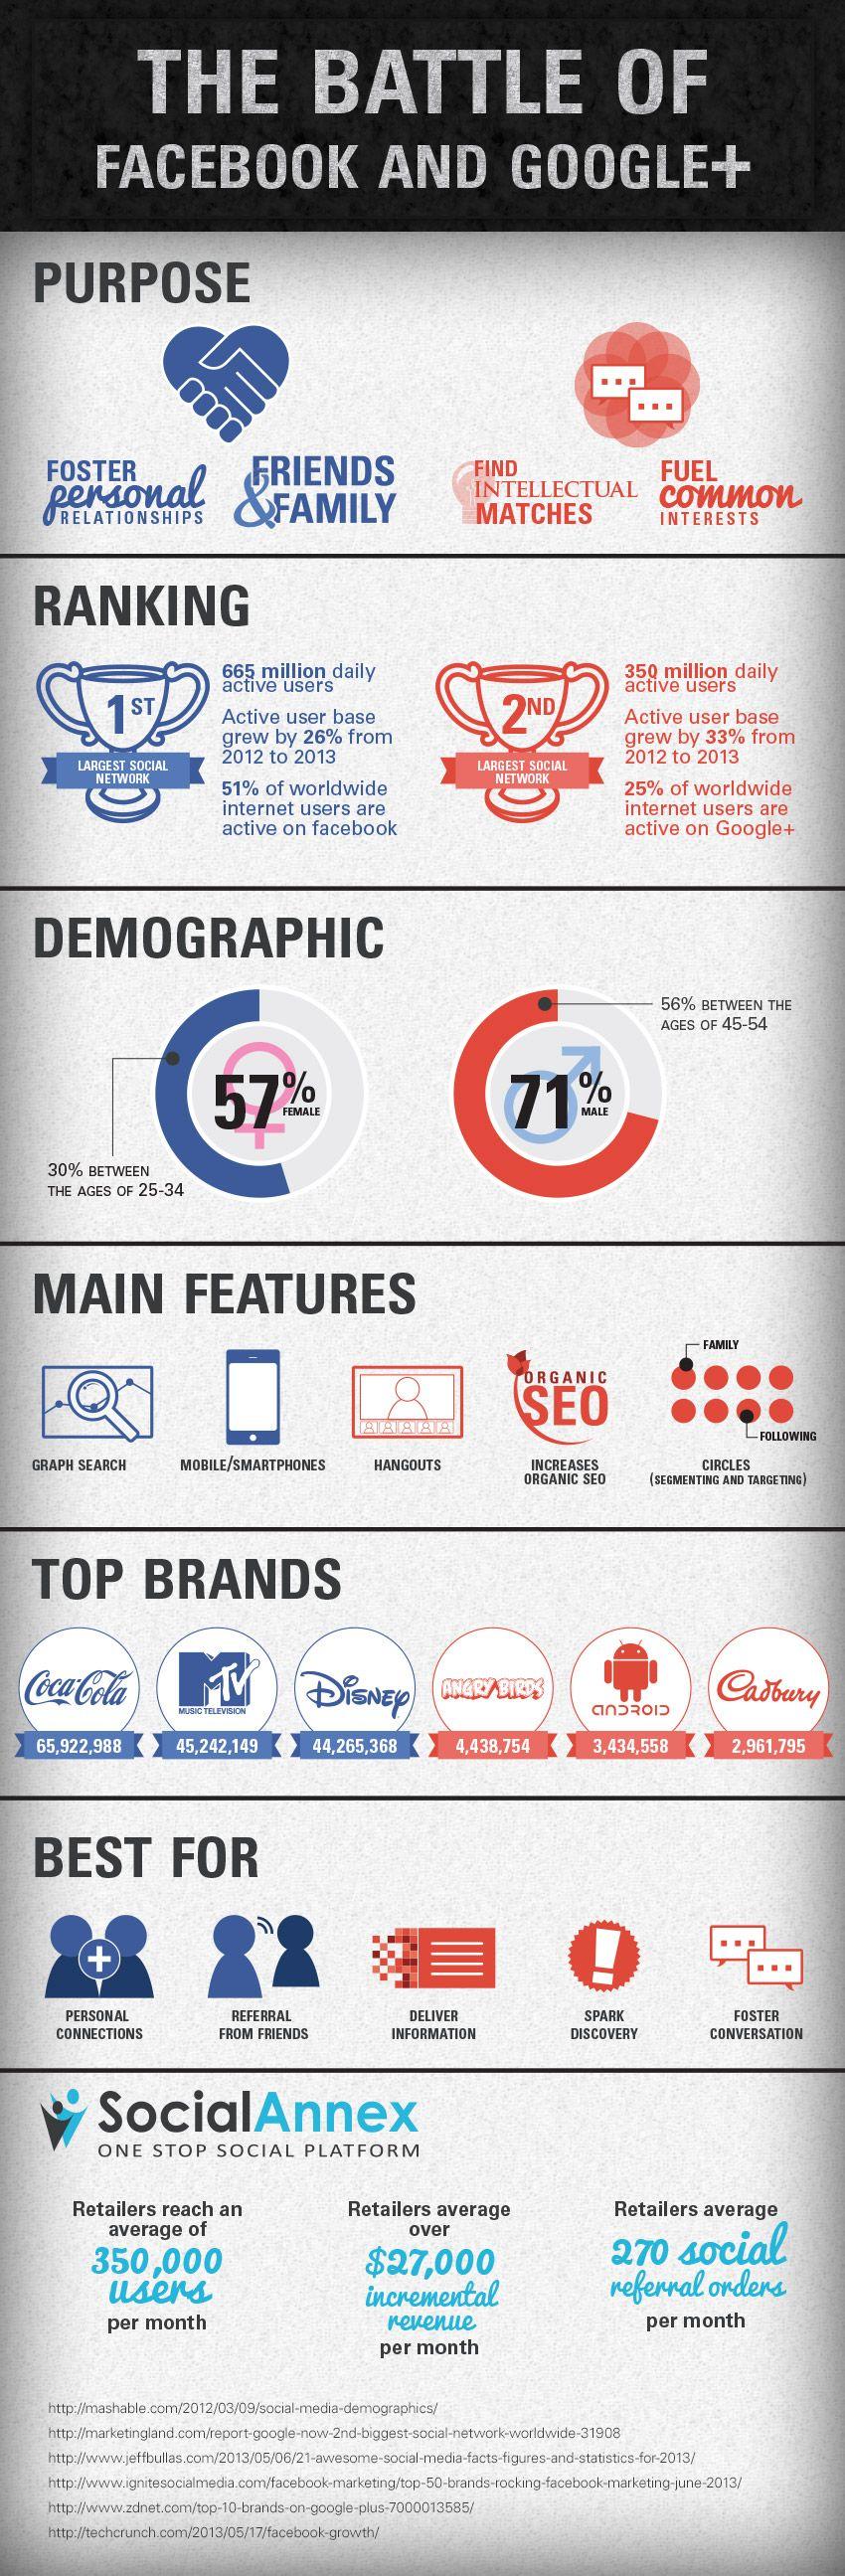 G+ versus Facebook [INFOGRAPHIC]   Social Media Today